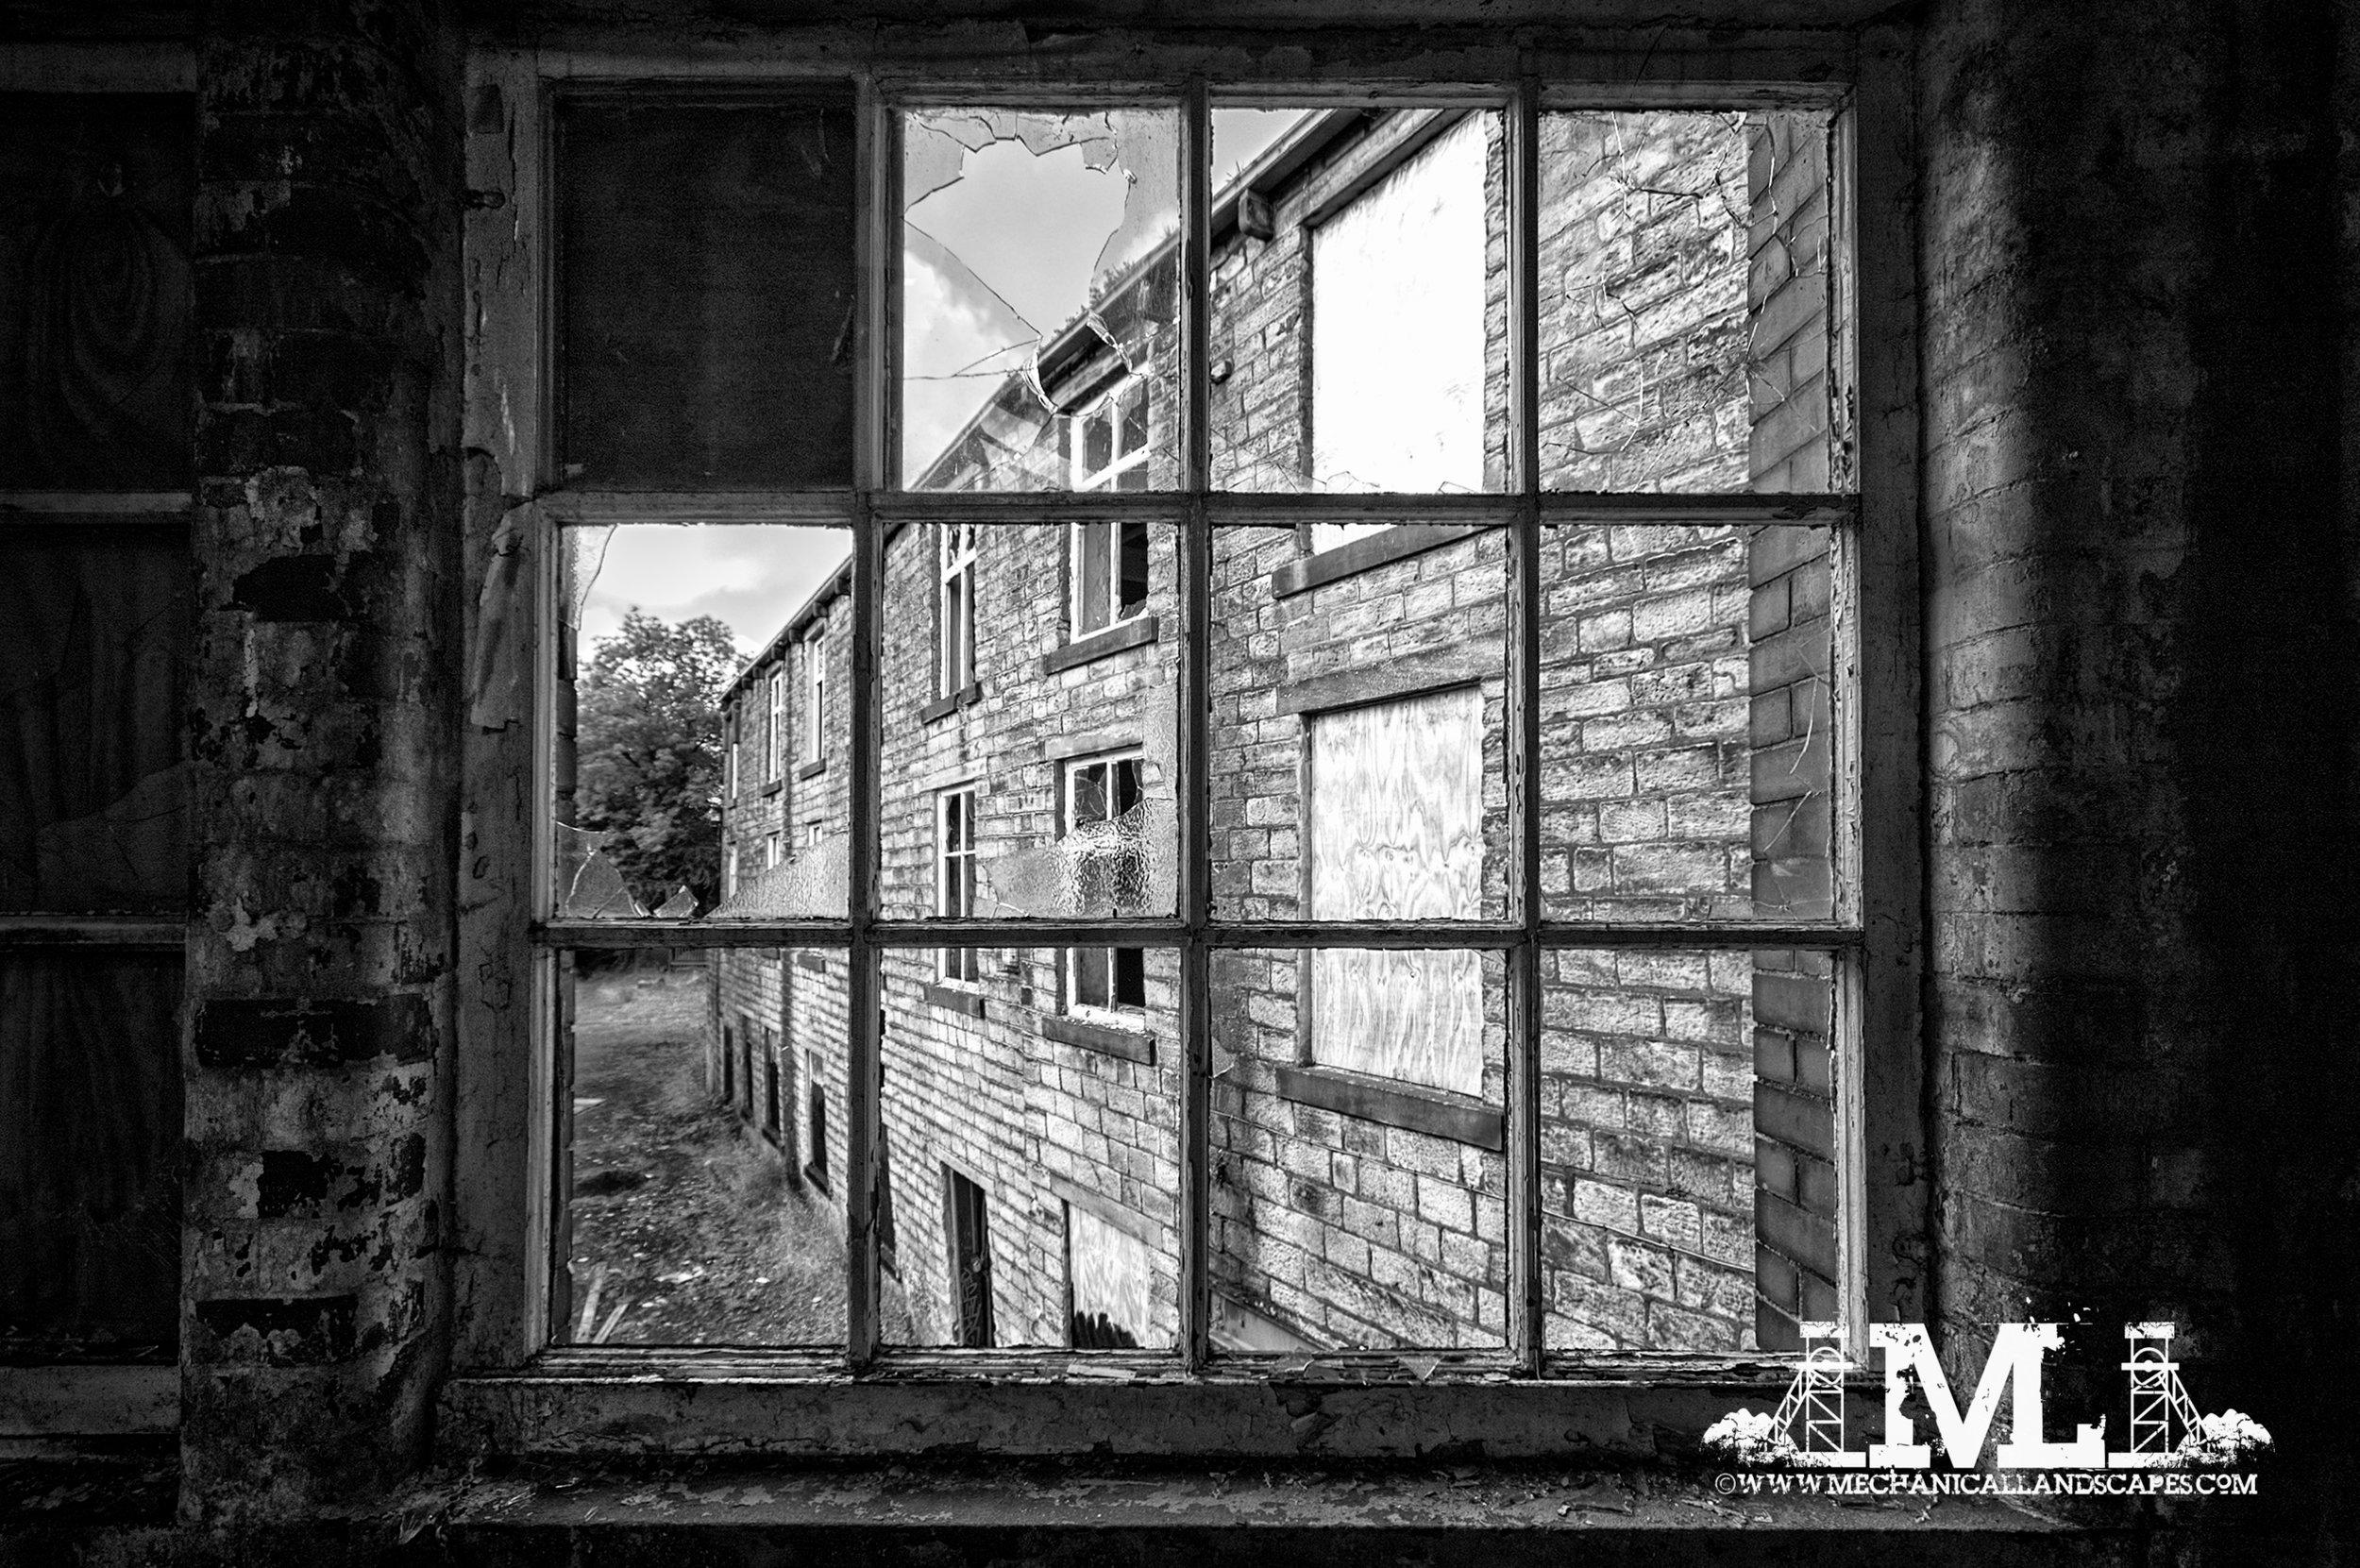 Edenwood Mill, Ramsbottom